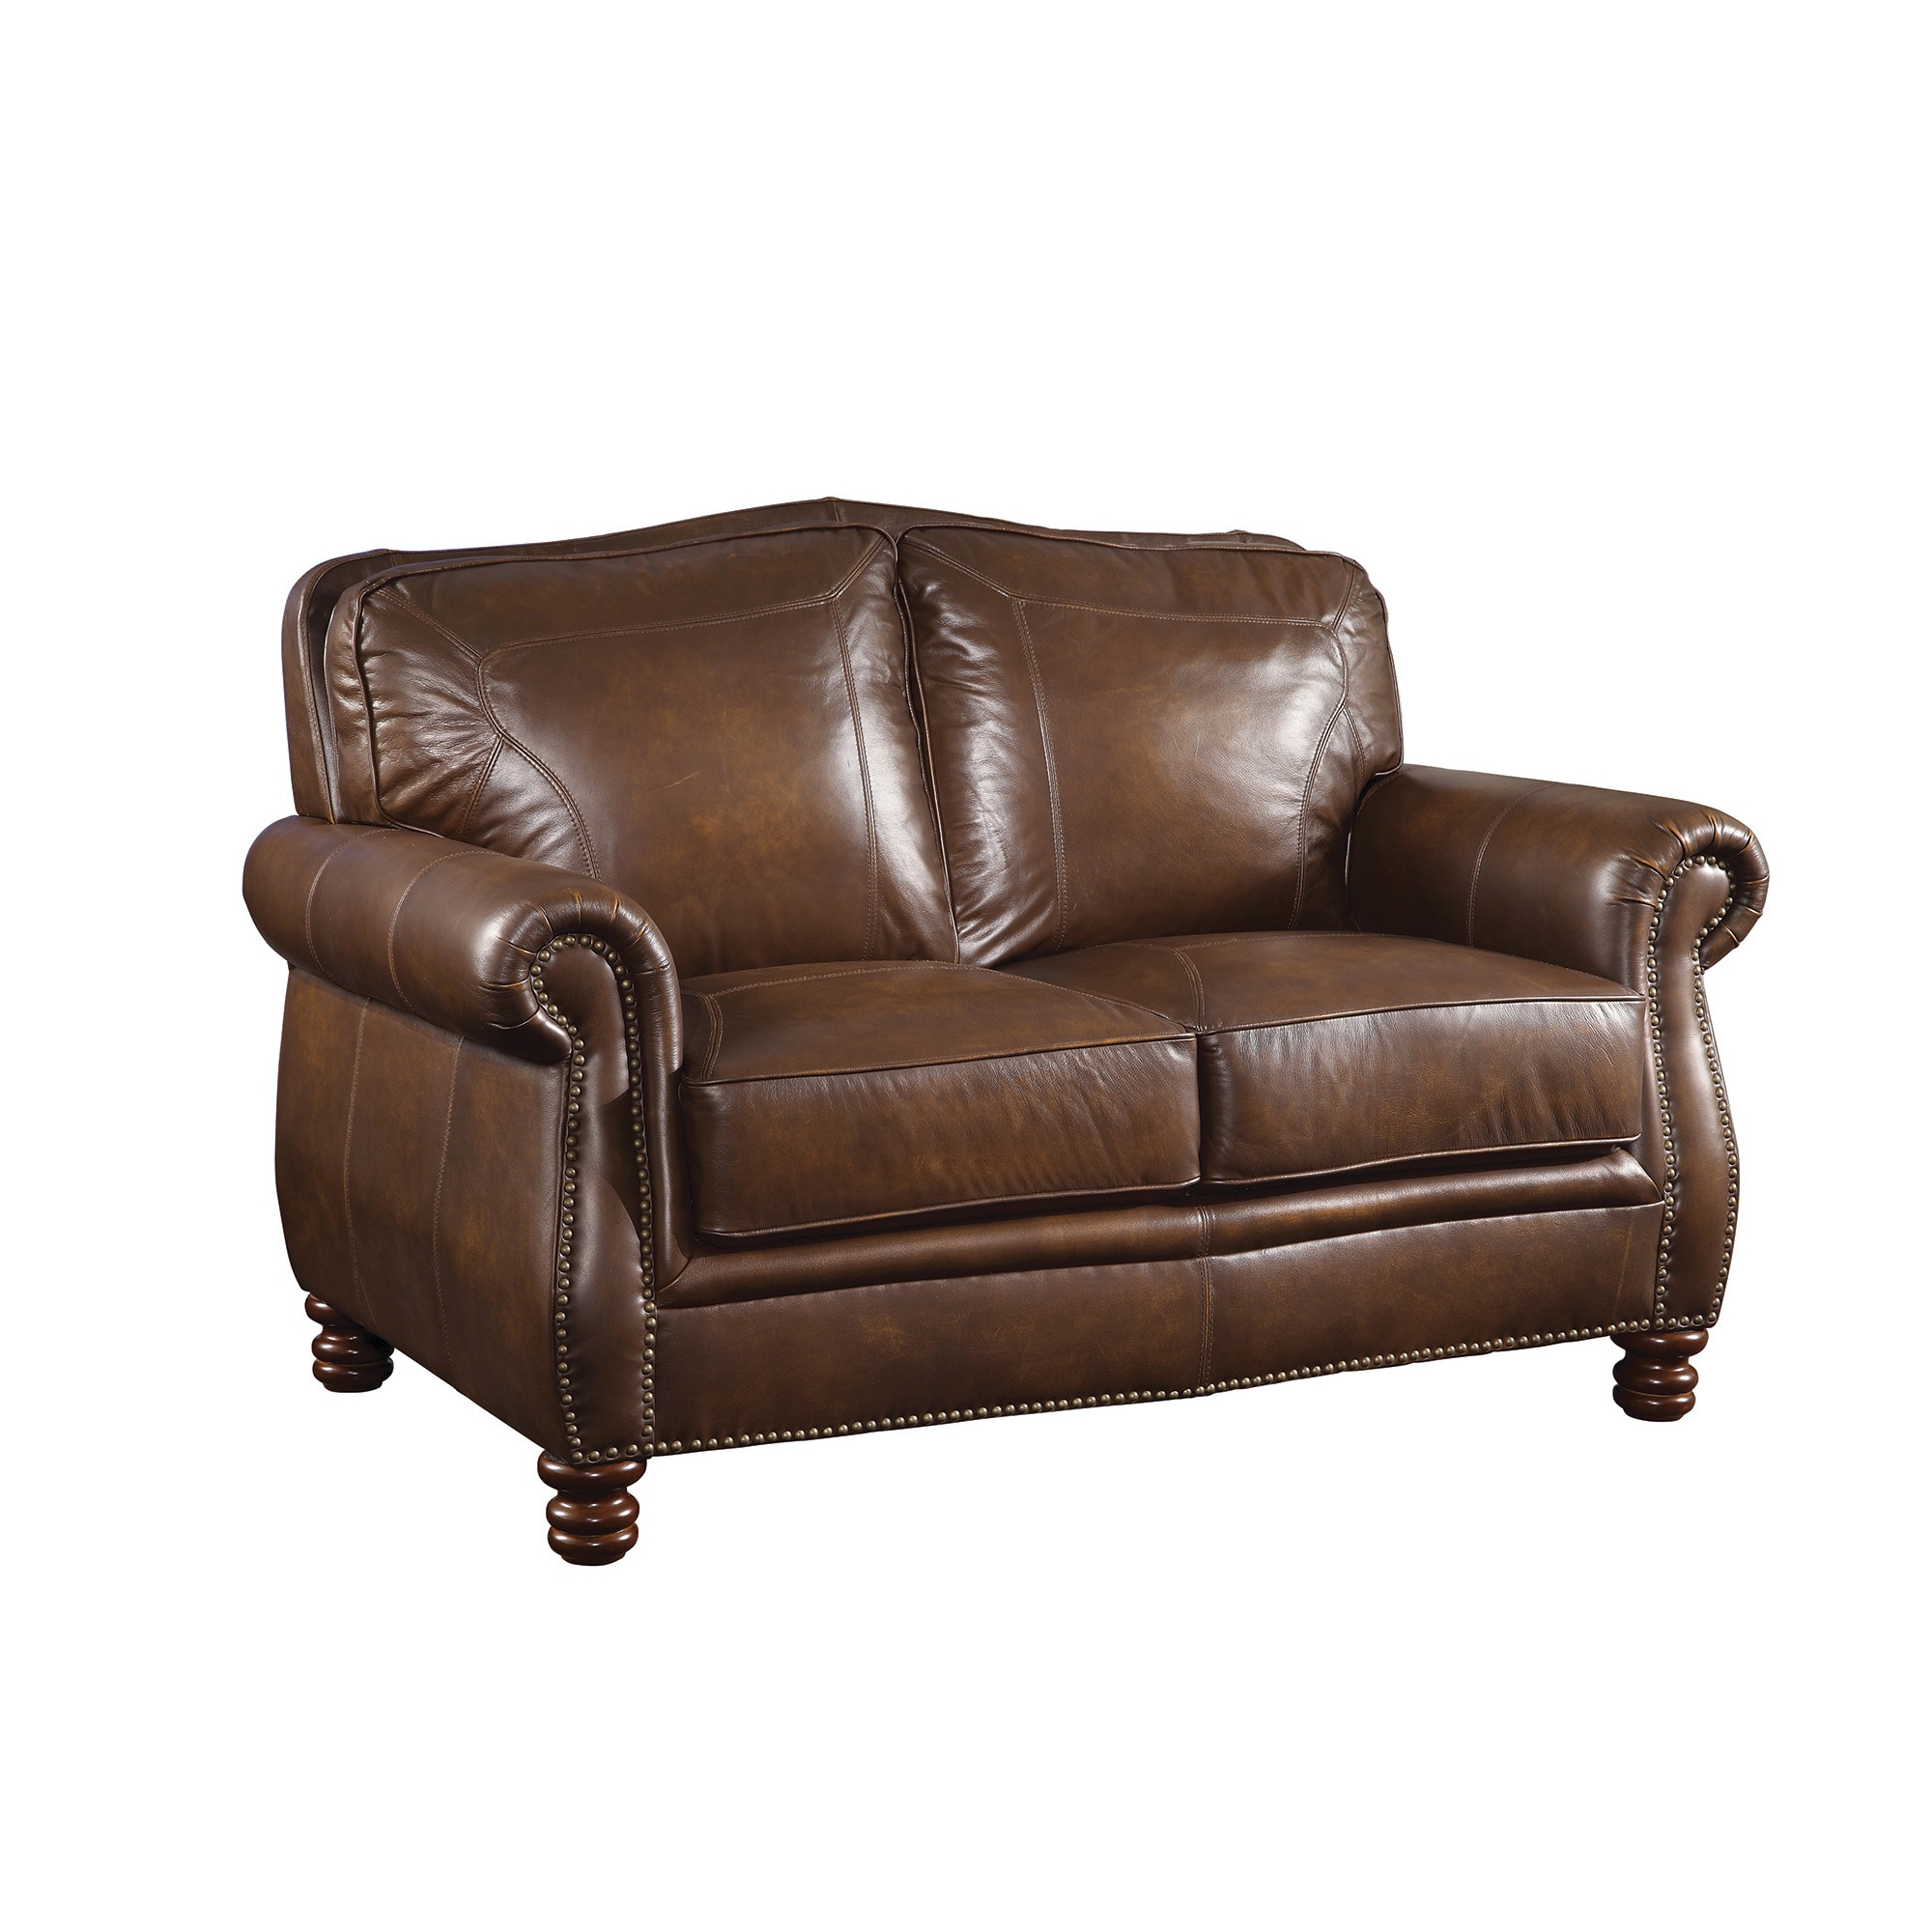 Coaster Company Nailhead Trim Brown Leather Sofa